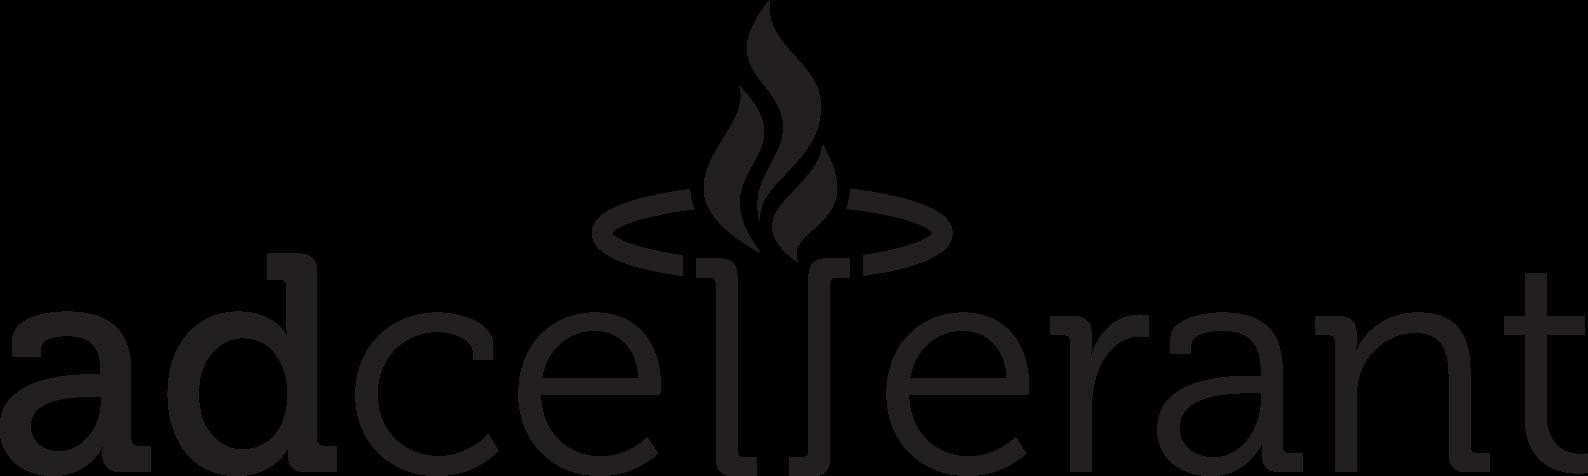 AdCellerant-Logo-1C-2